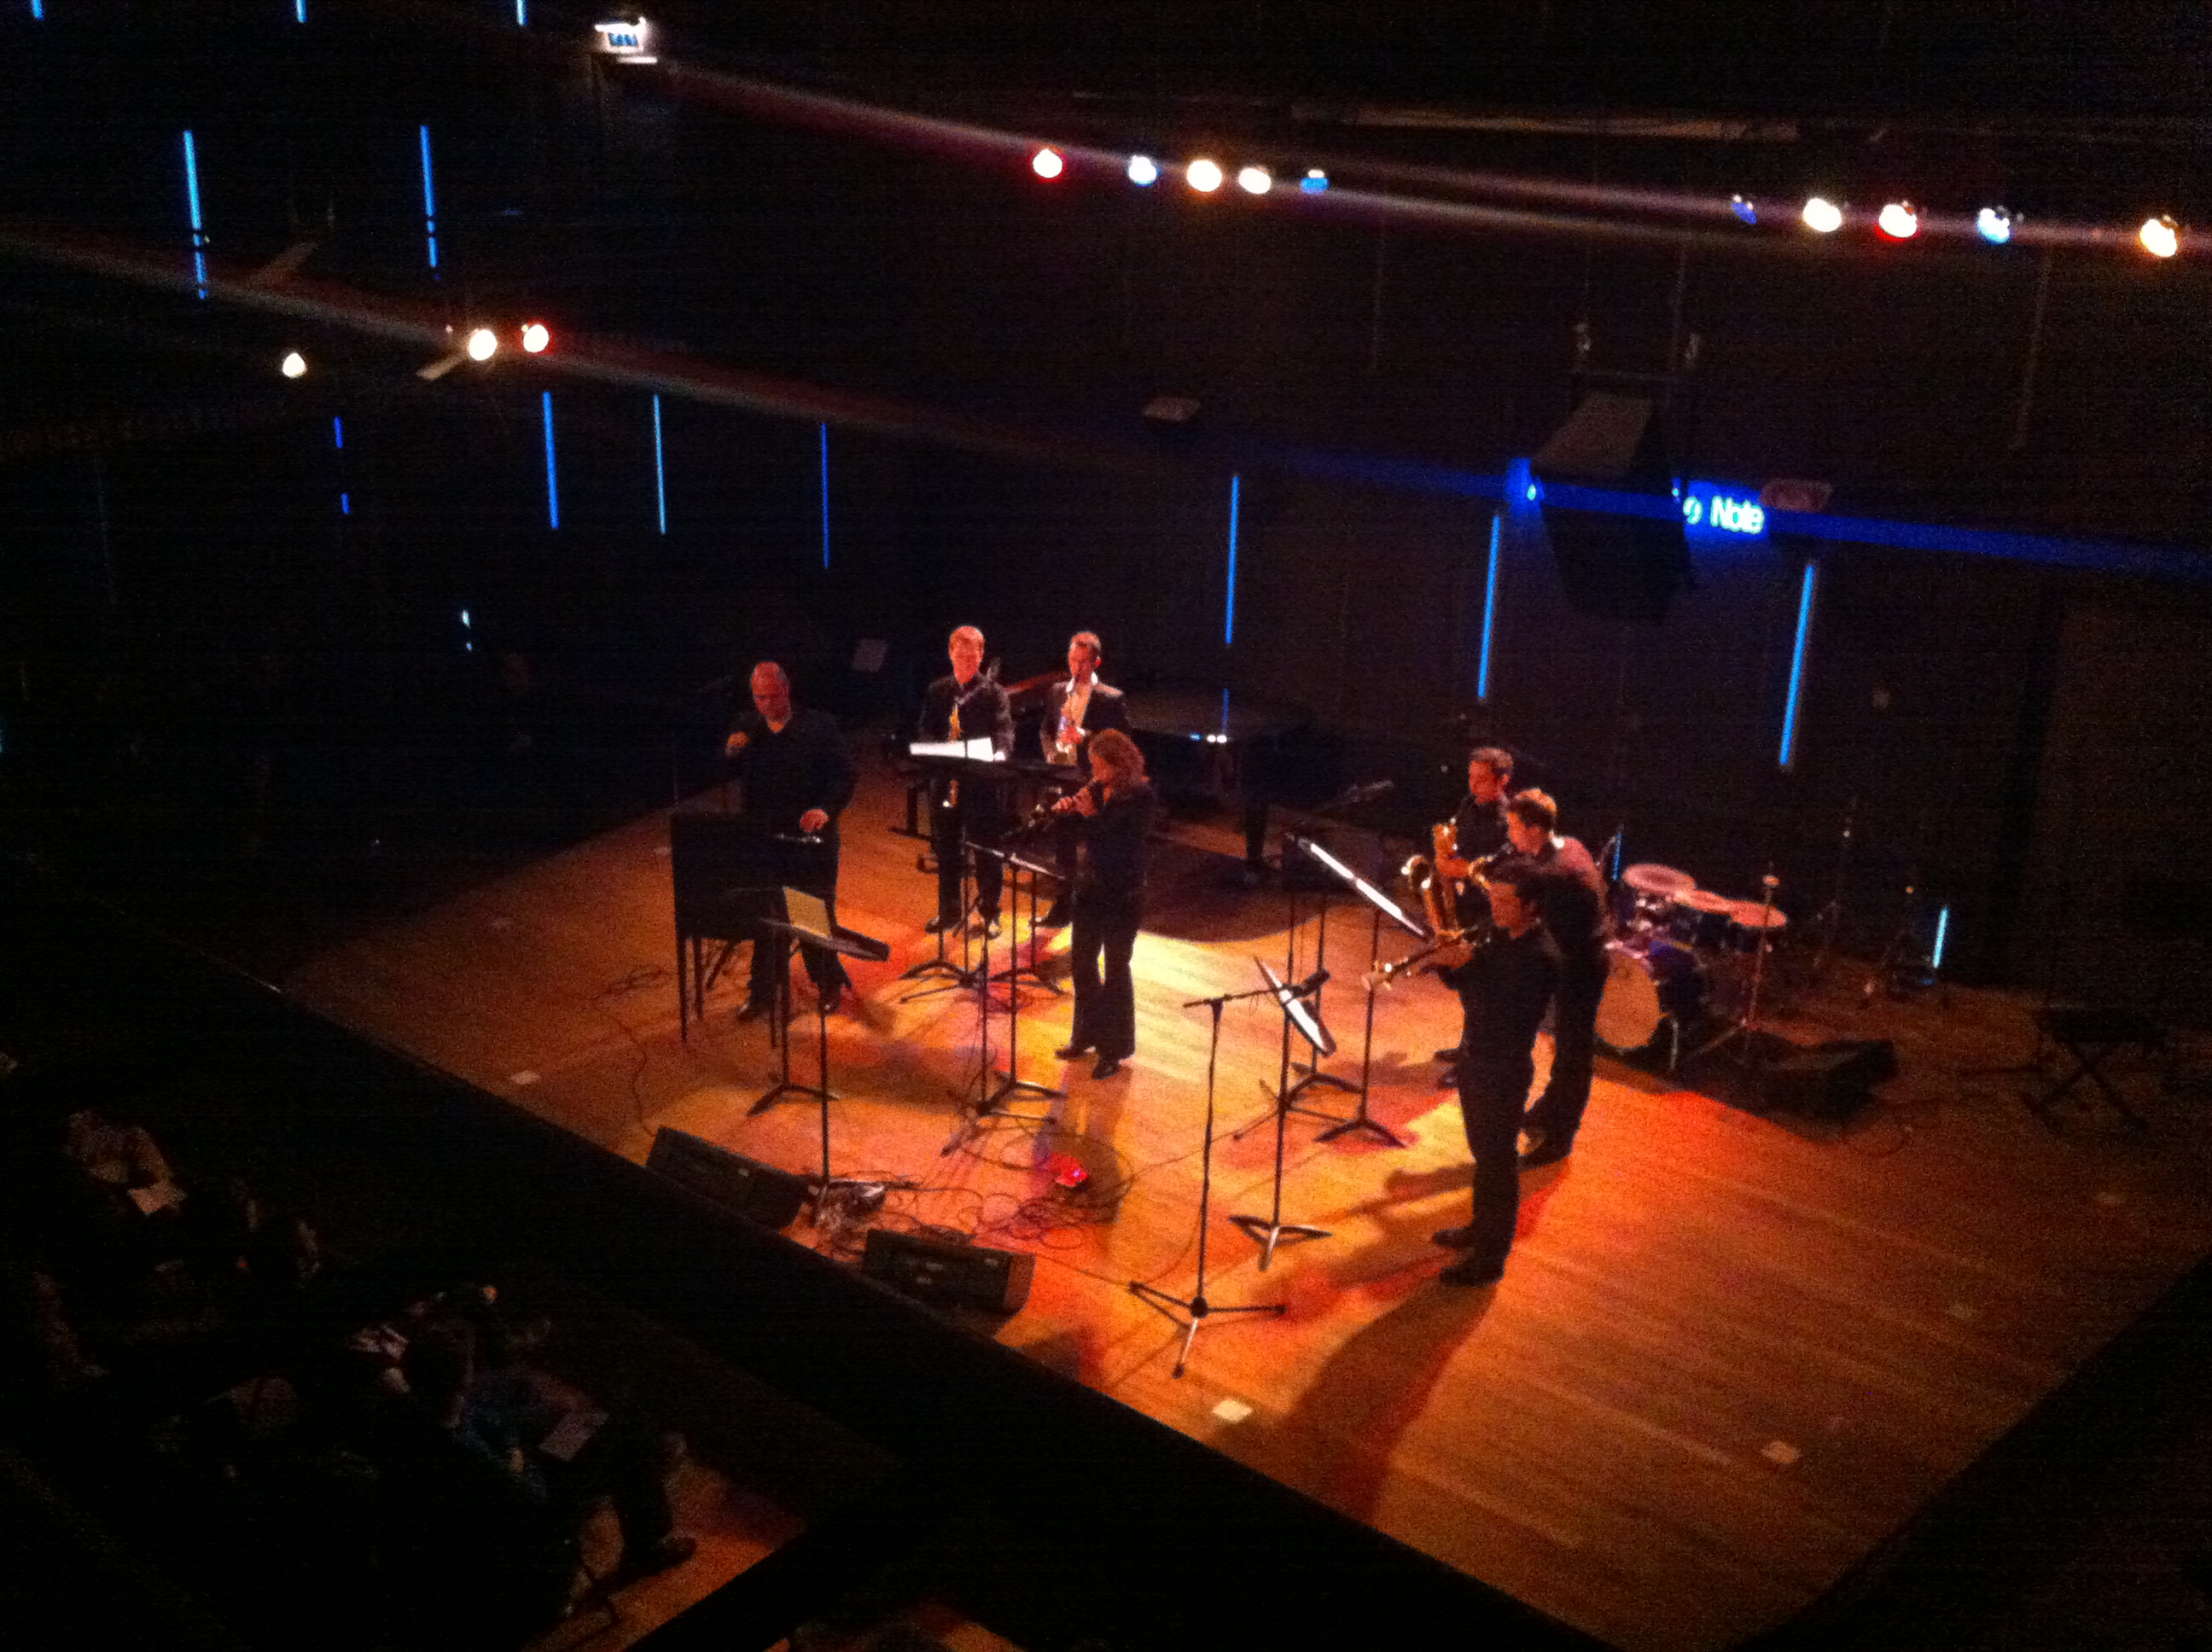 Theremin World - The 528Hz Ensemble with Thorwald Jørgensen